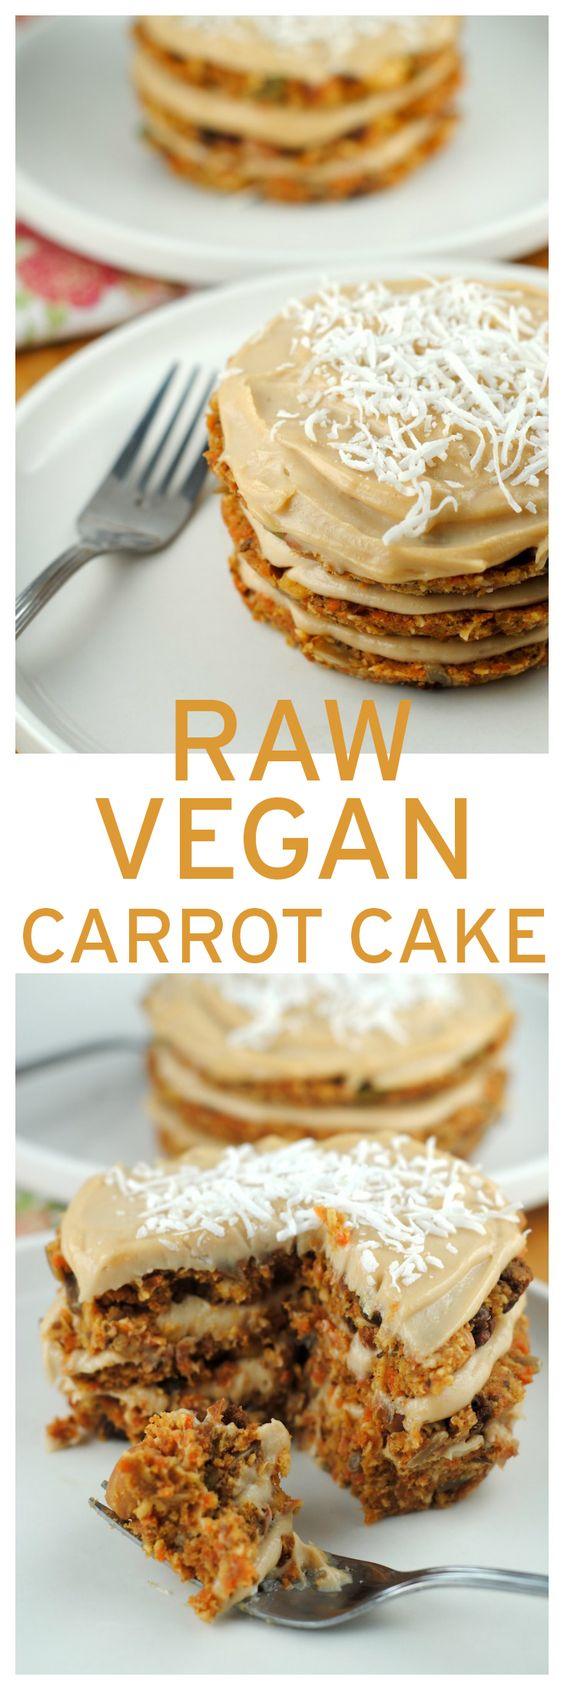 Dessert Recipe: Raw Vegan Carrot Cake #vegan #healthy #plantbased #whatveganseat #recipes #glutenfree #dessert